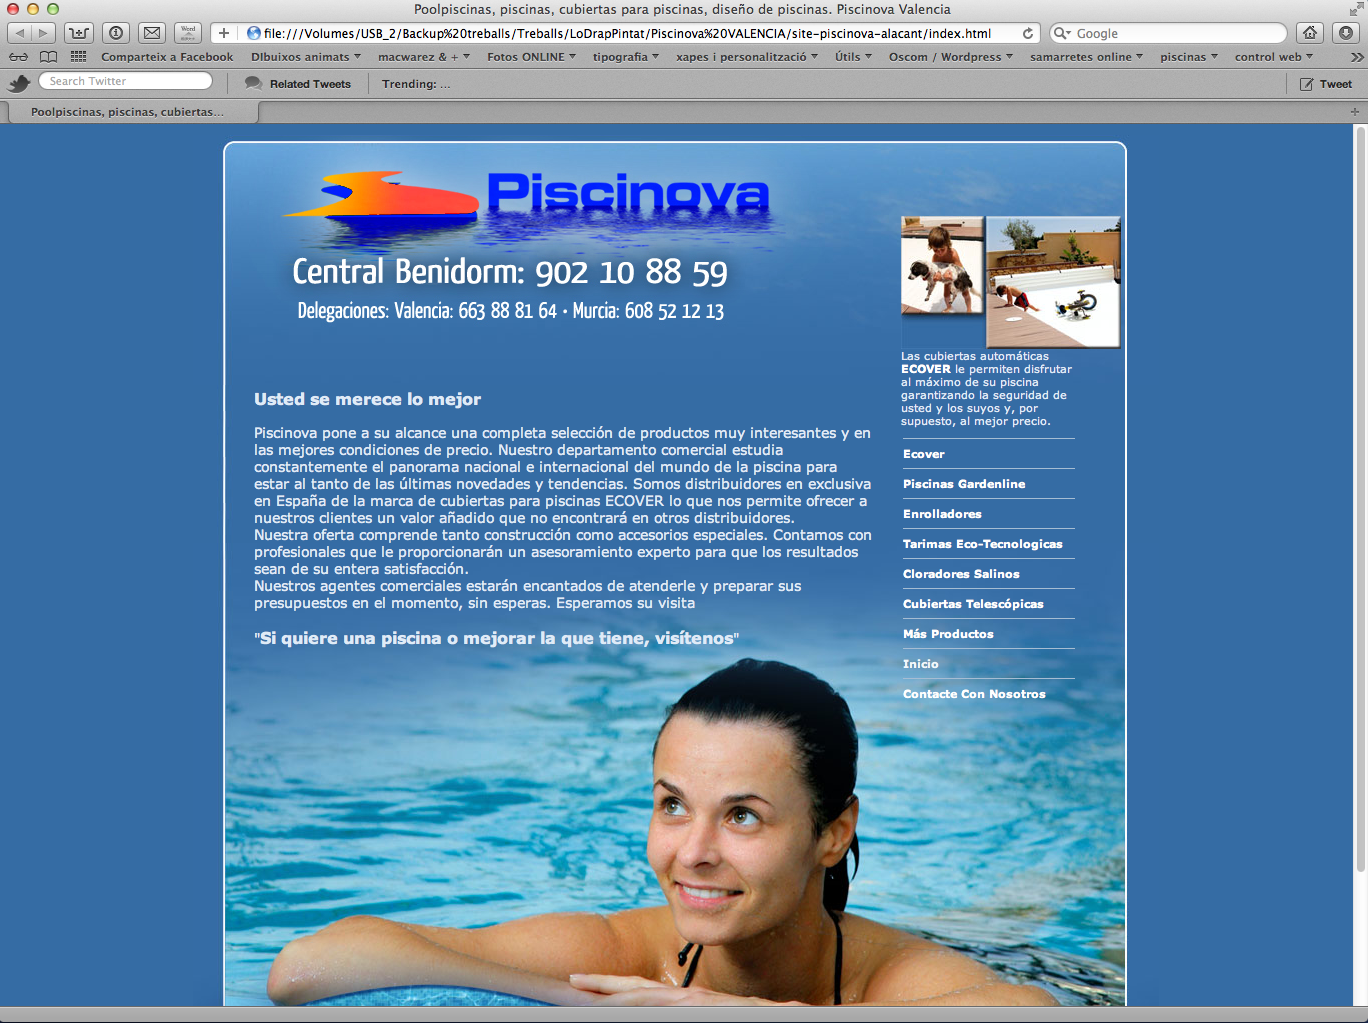 Piscinova